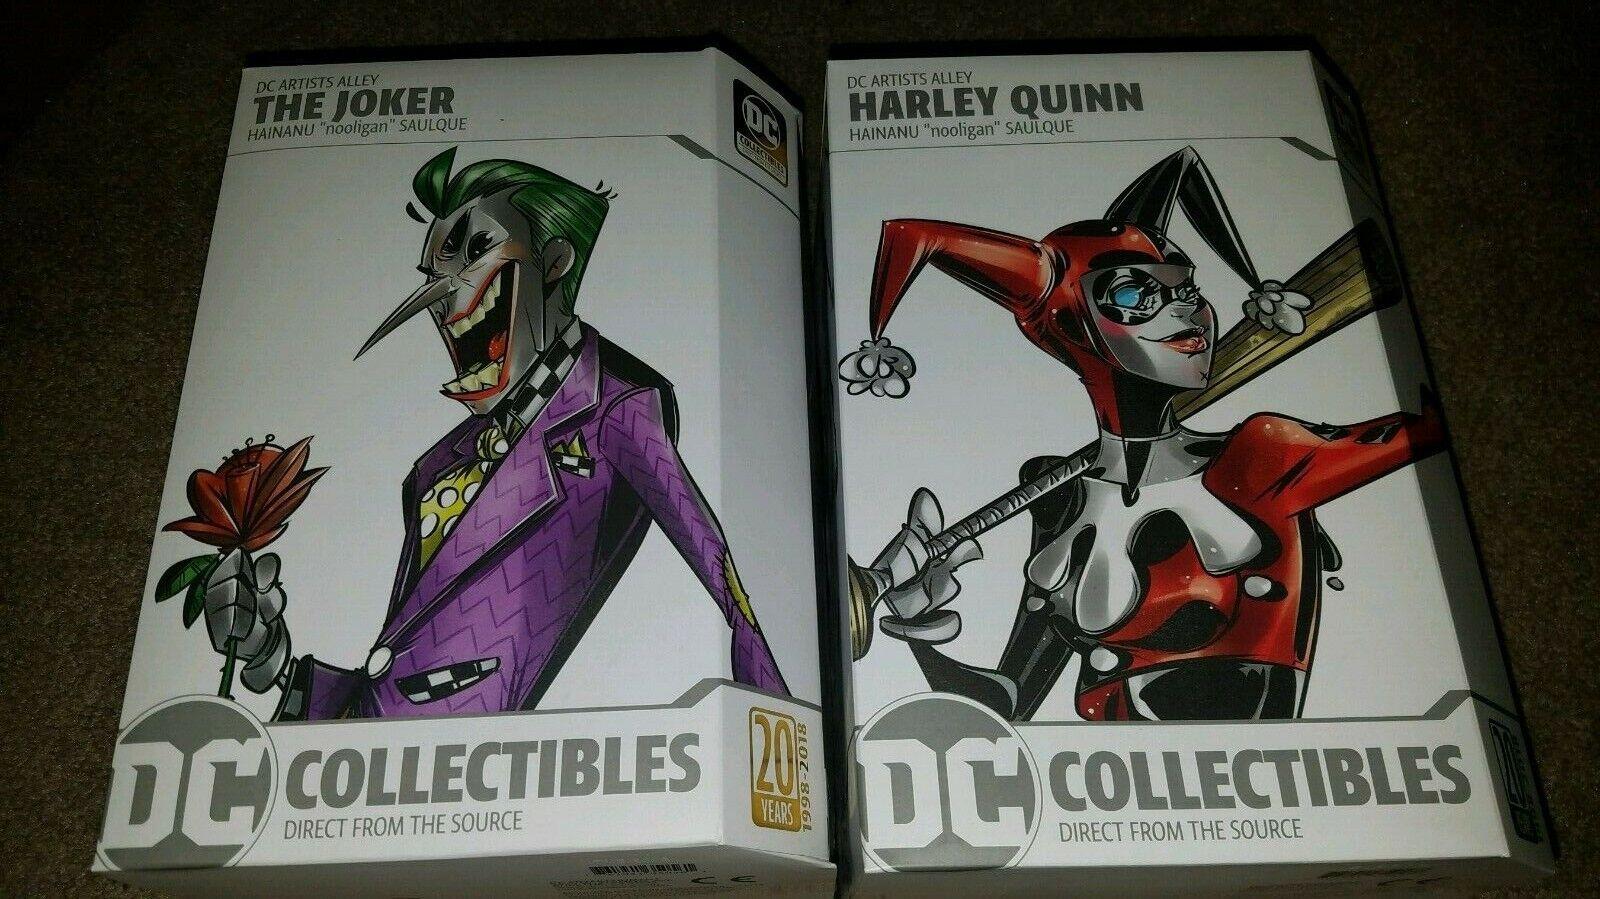 DC Coleccionables DC artistas callejón el Guasón, Harley Quinn hainanu nooligan saulque